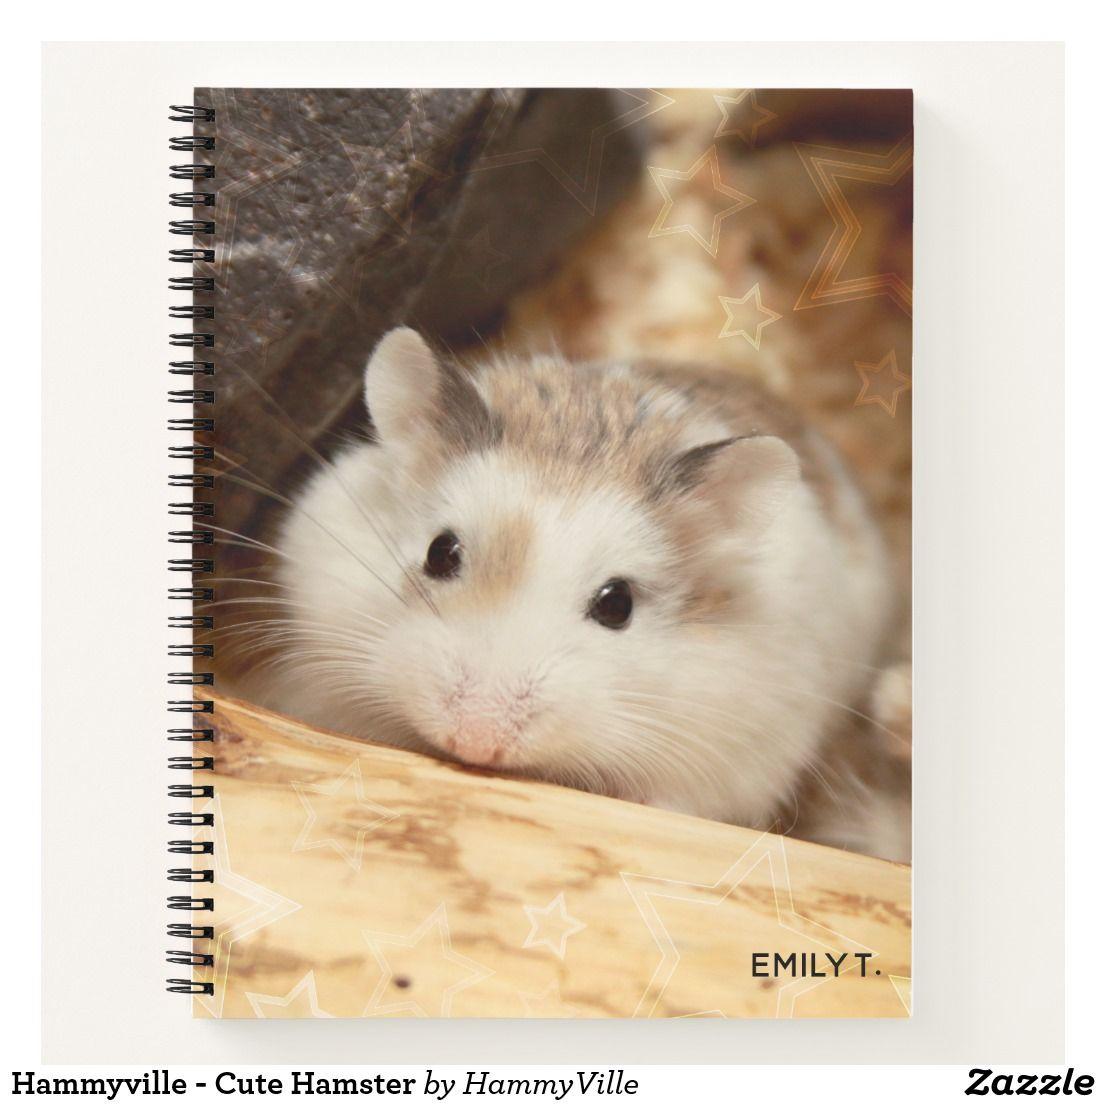 Hammyville Cute Hamster Notebook Hamster Cute Cuteanimals Cutehamster Hammyville Notebook Cute Hamsters Hamster Notebook Features